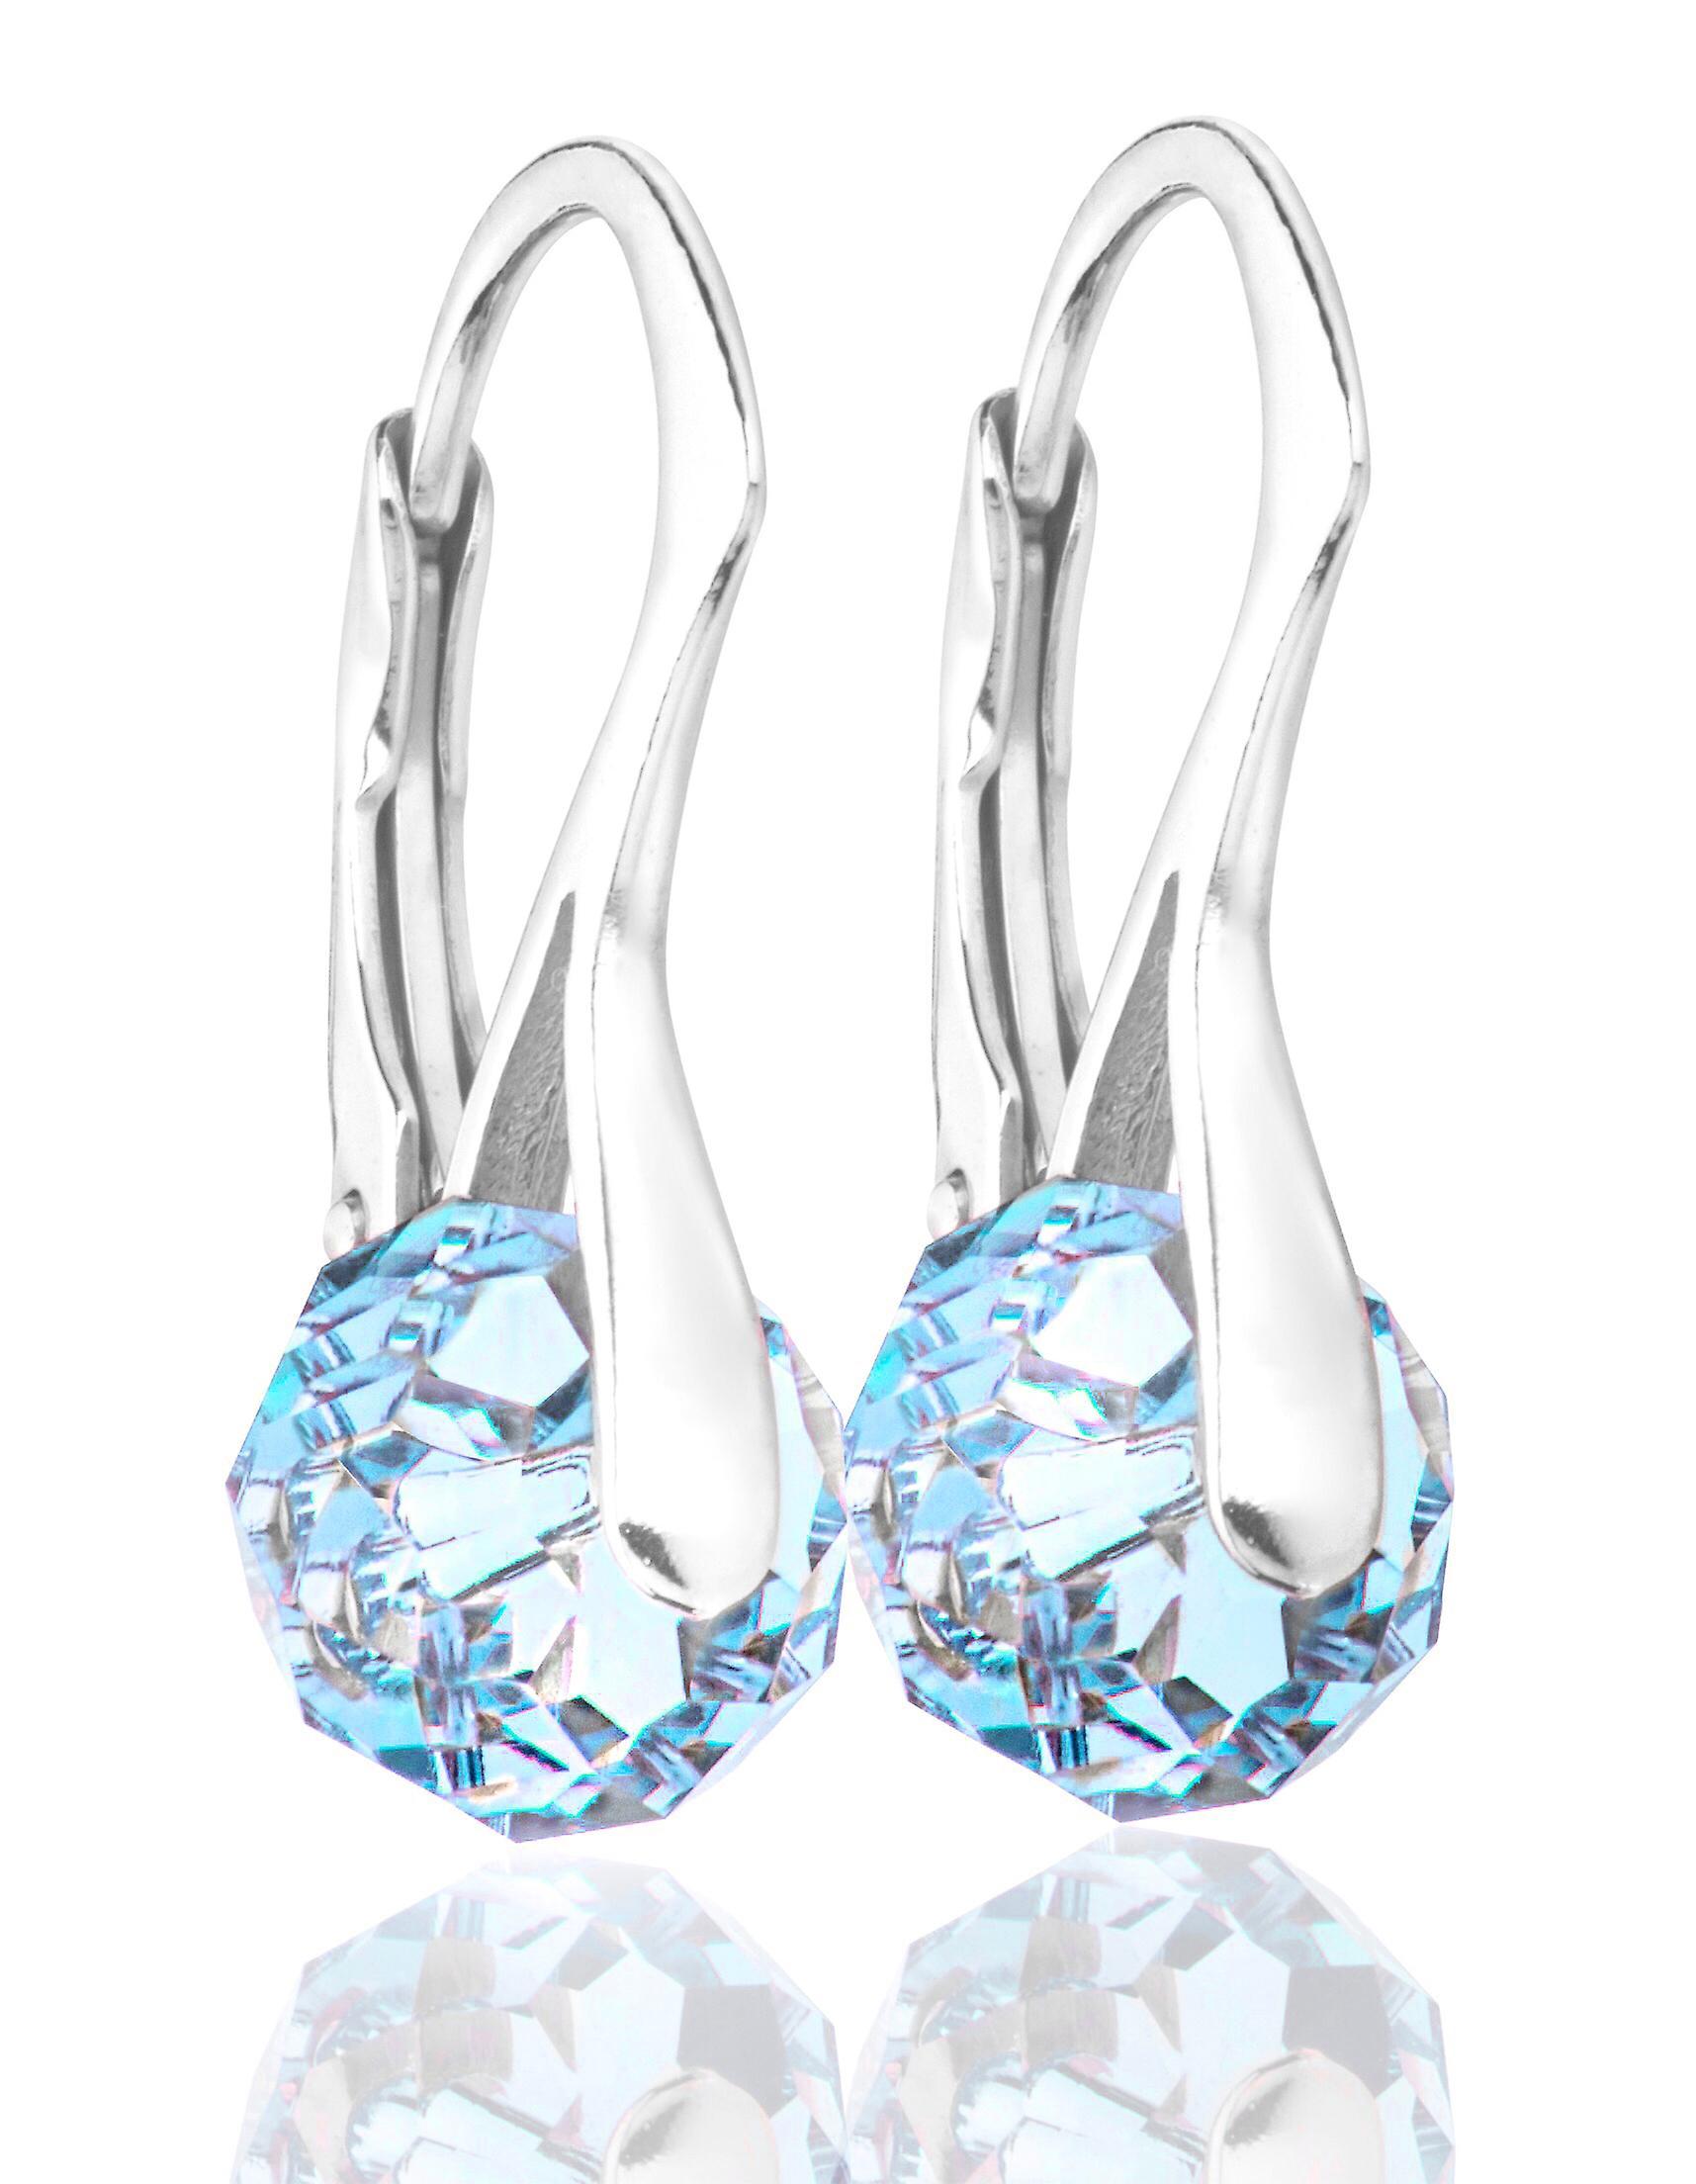 Women's Stunning Briolette Round Crystals From Swarovski® Earrings